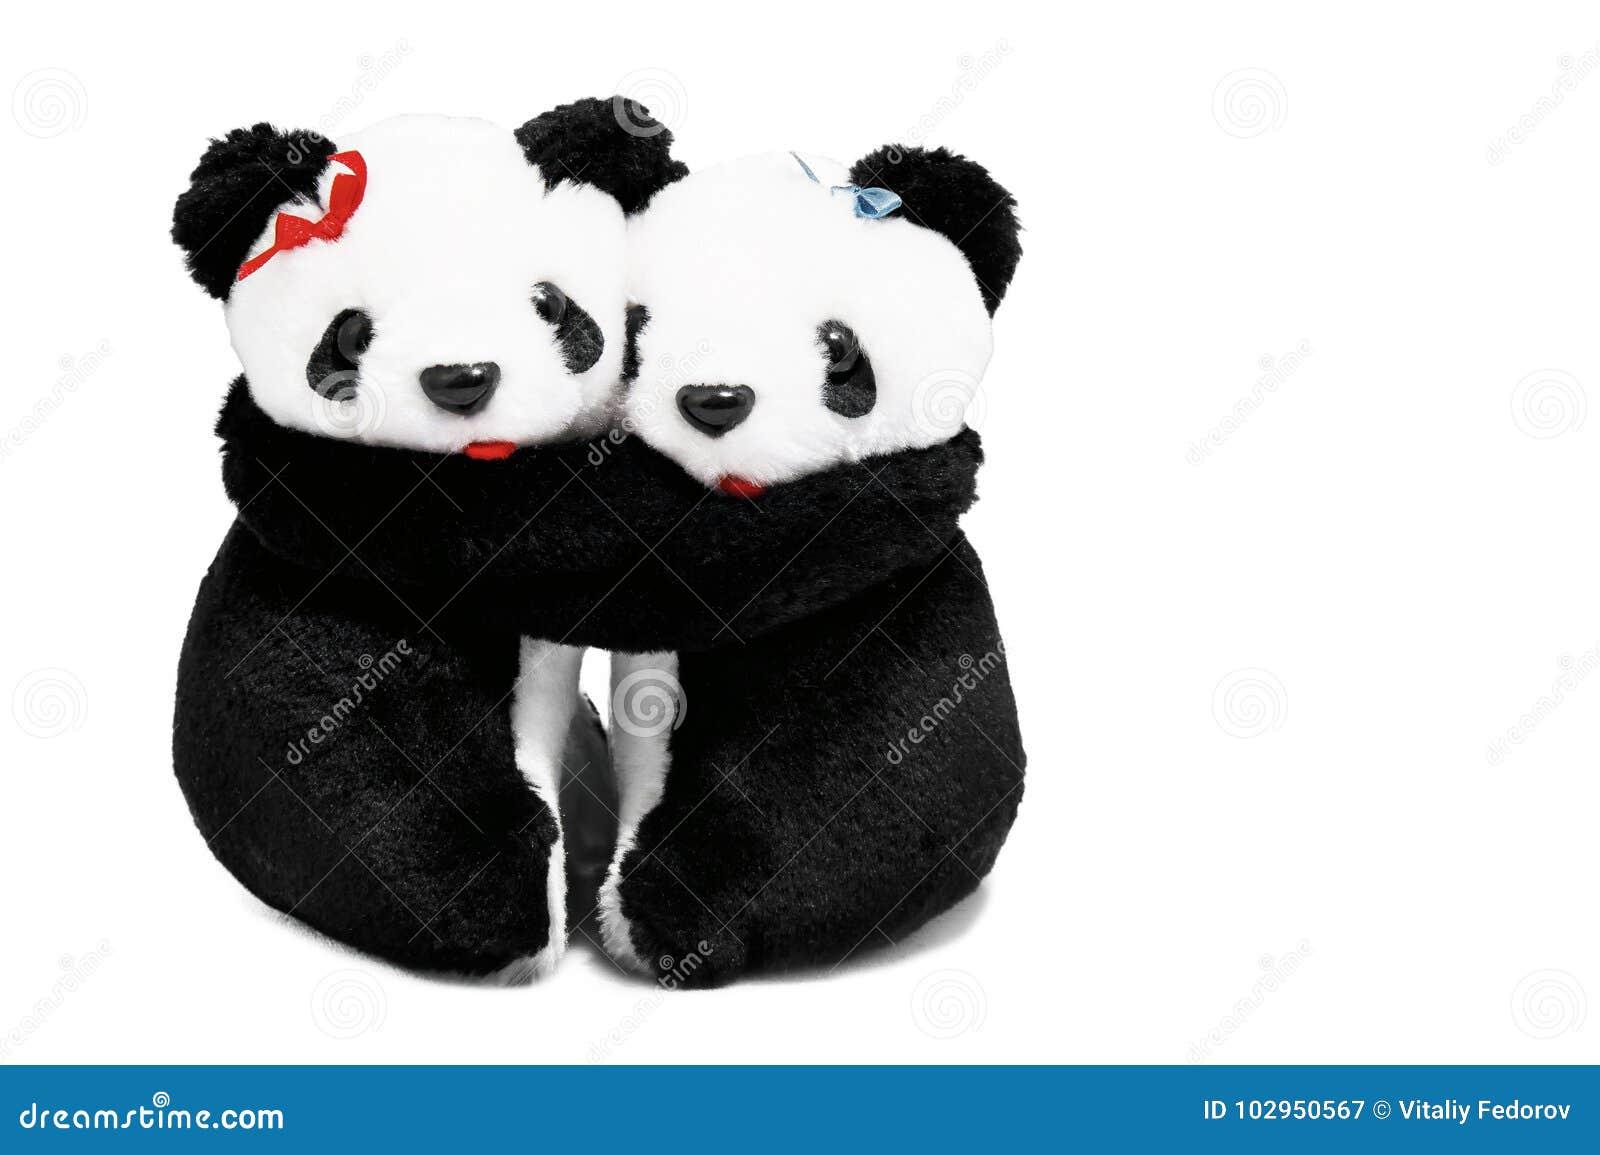 Two pandas bears on a white background